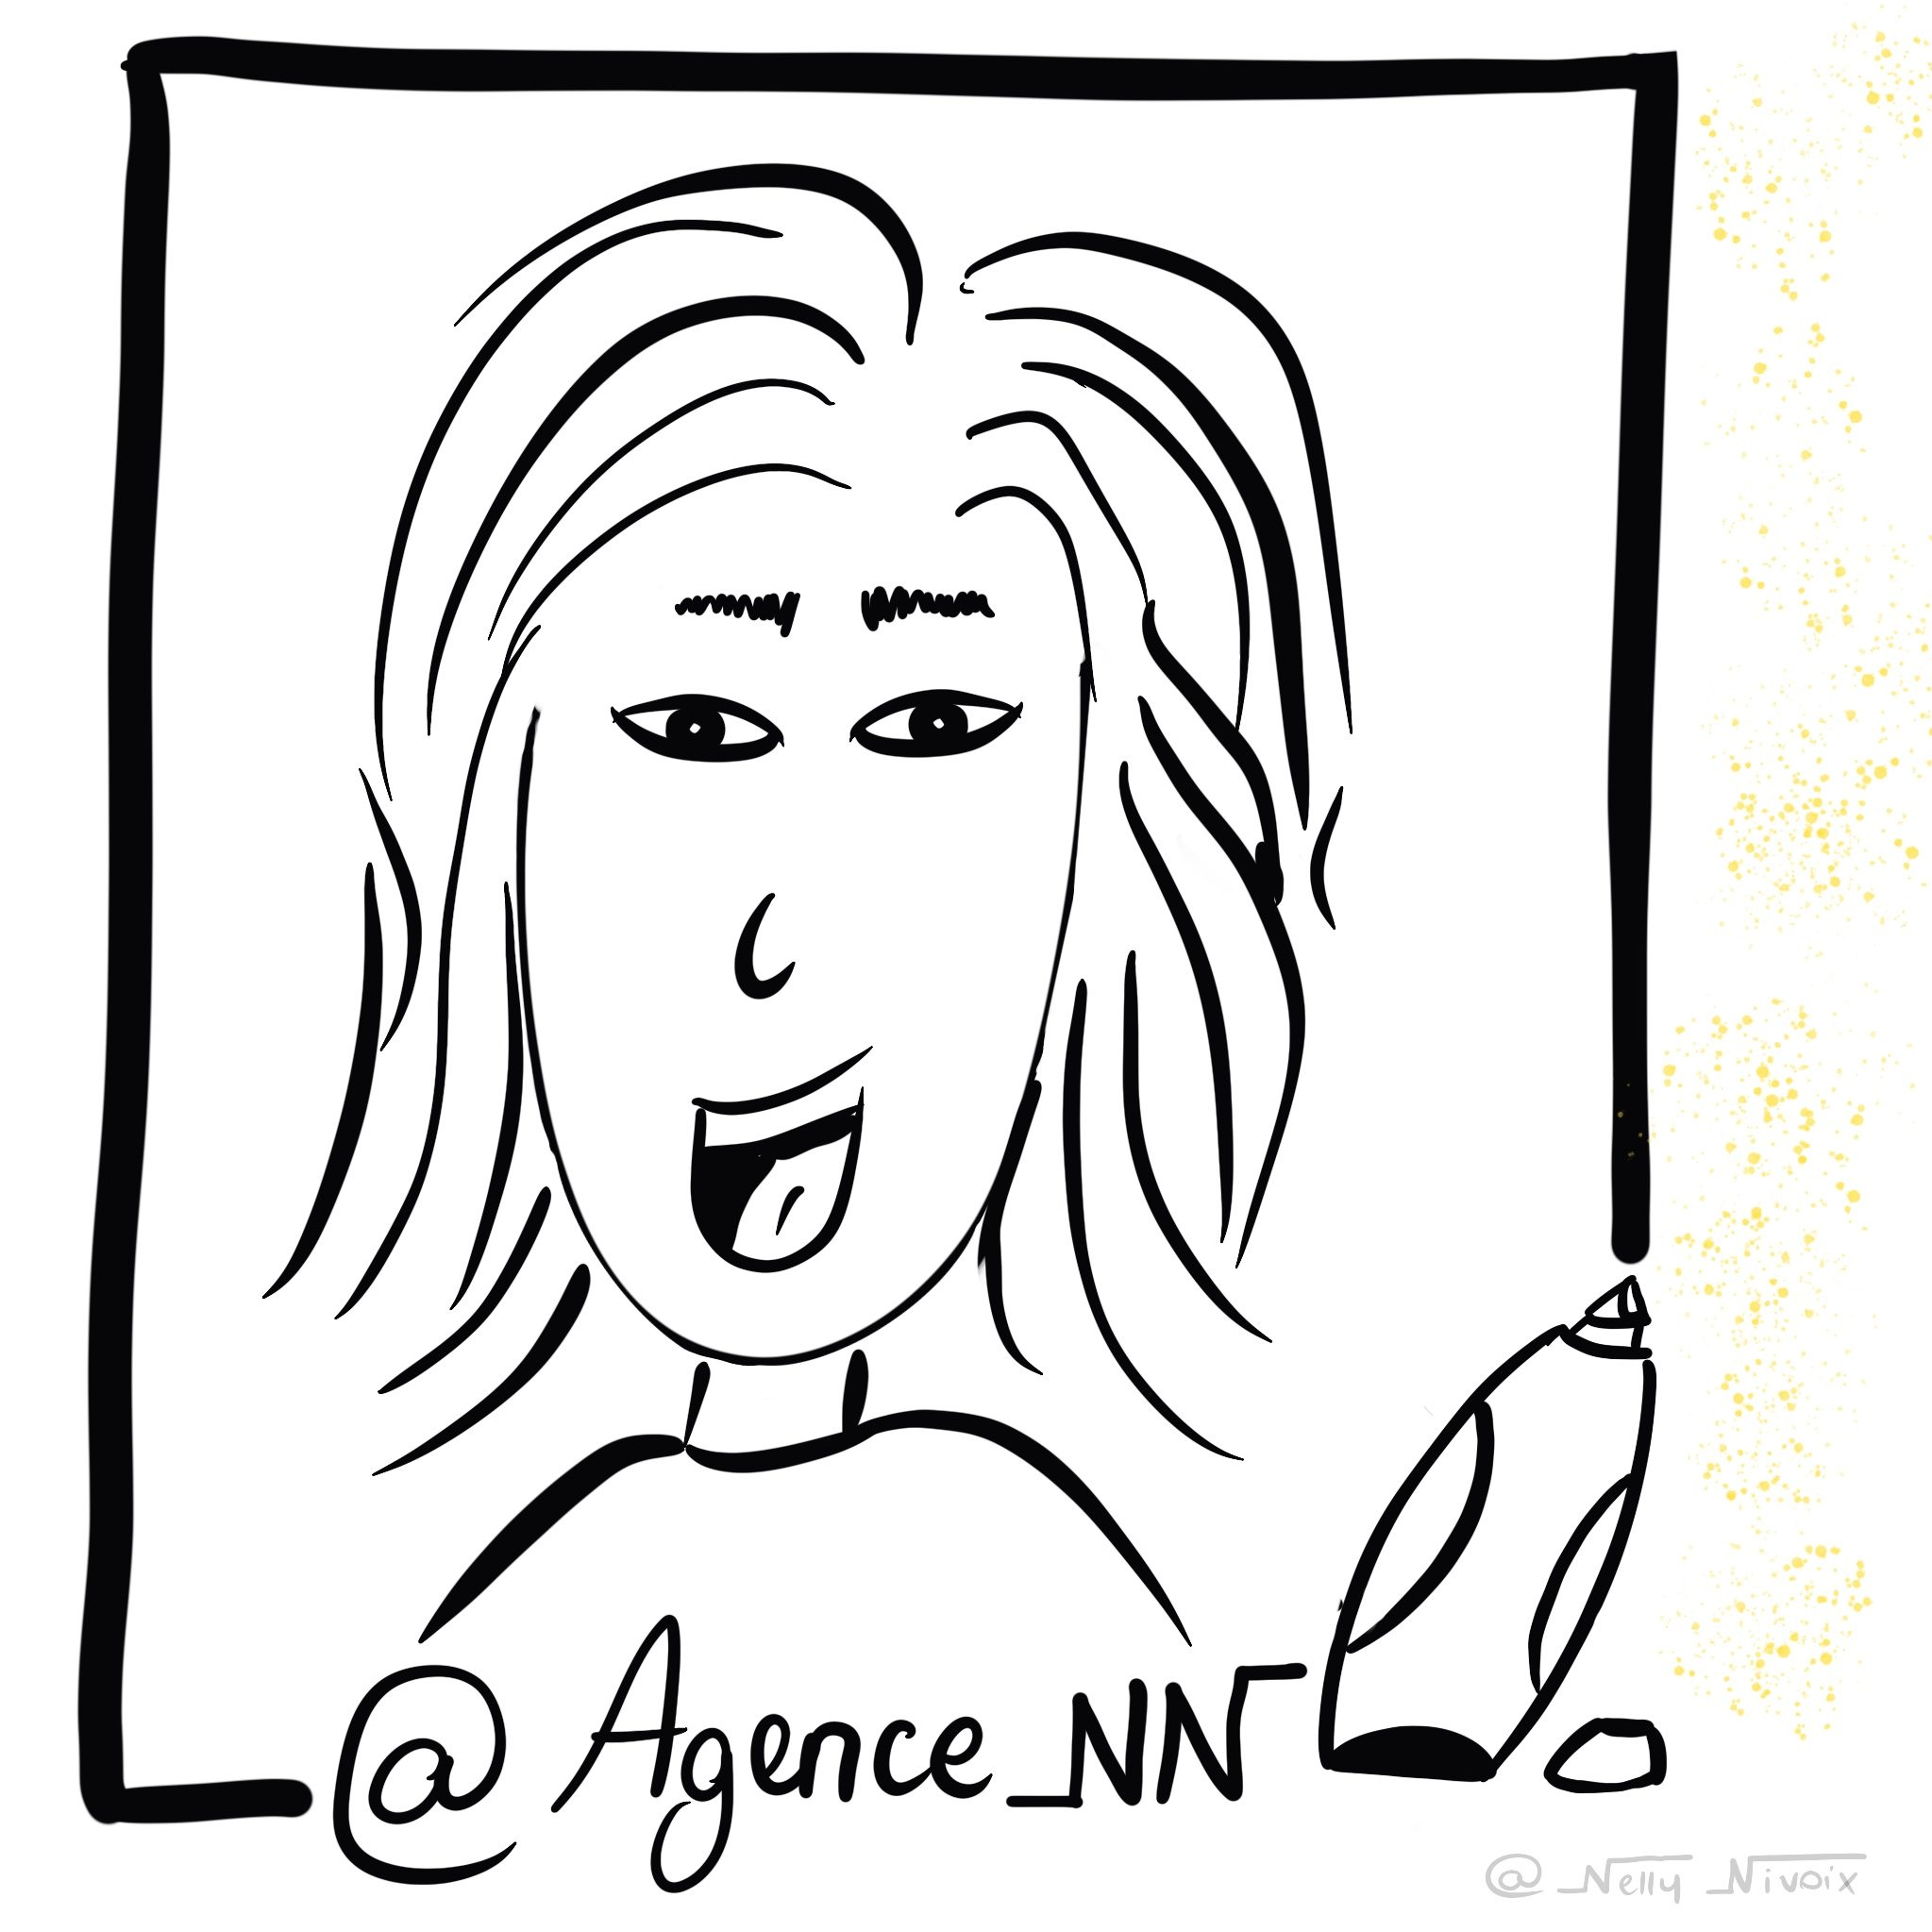 logo-agence-nn-rédaction-correction-facilitation-graphique-drôme-ardèche